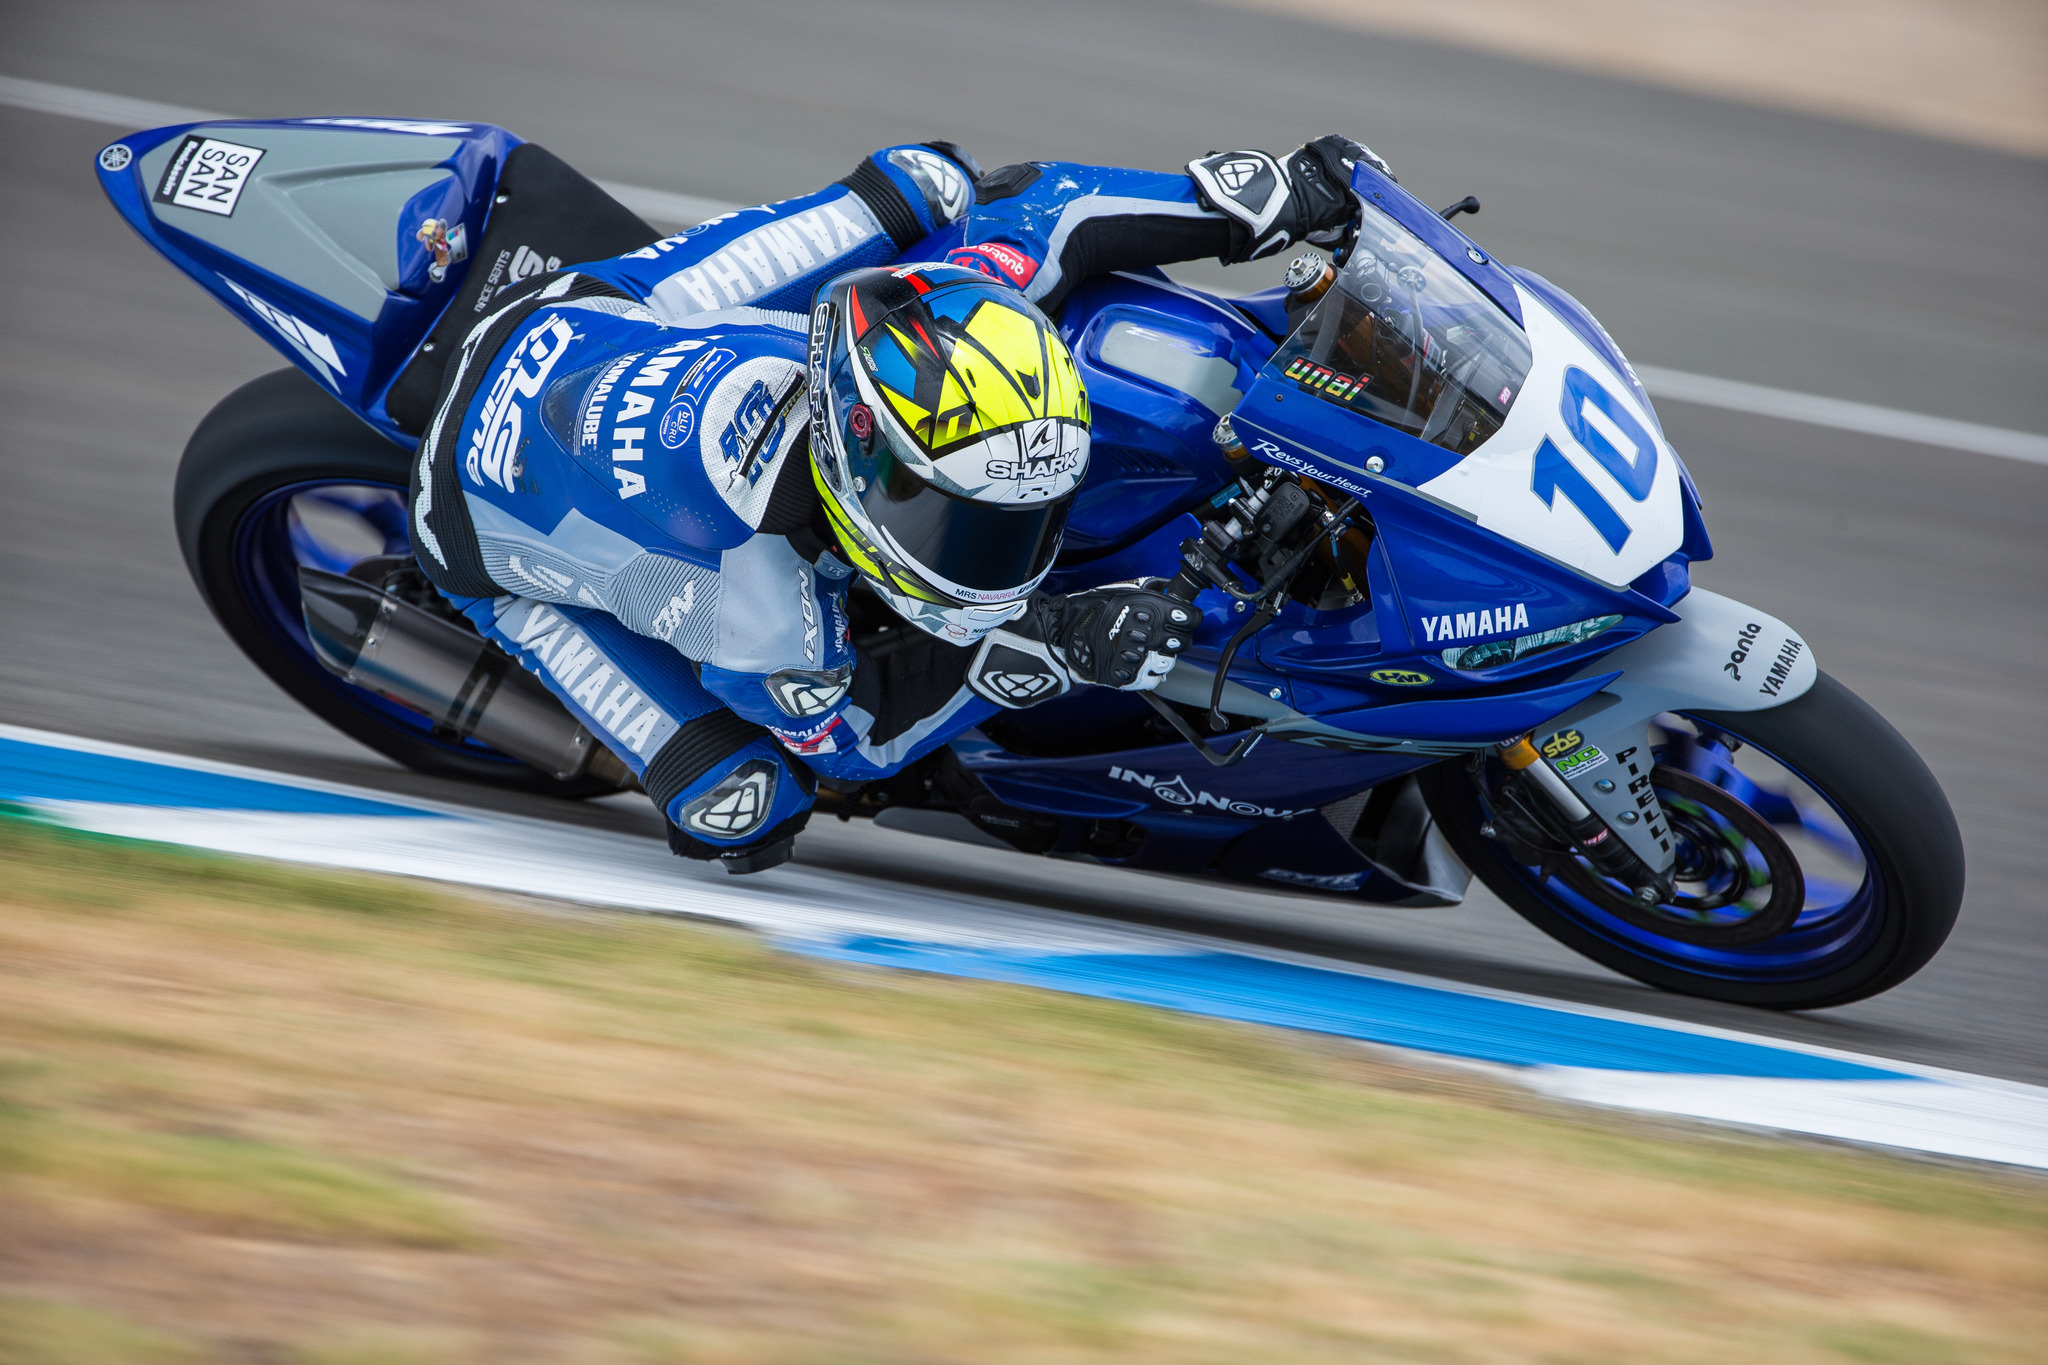 Unai Orradre (Yamaha), ganador en Jerez